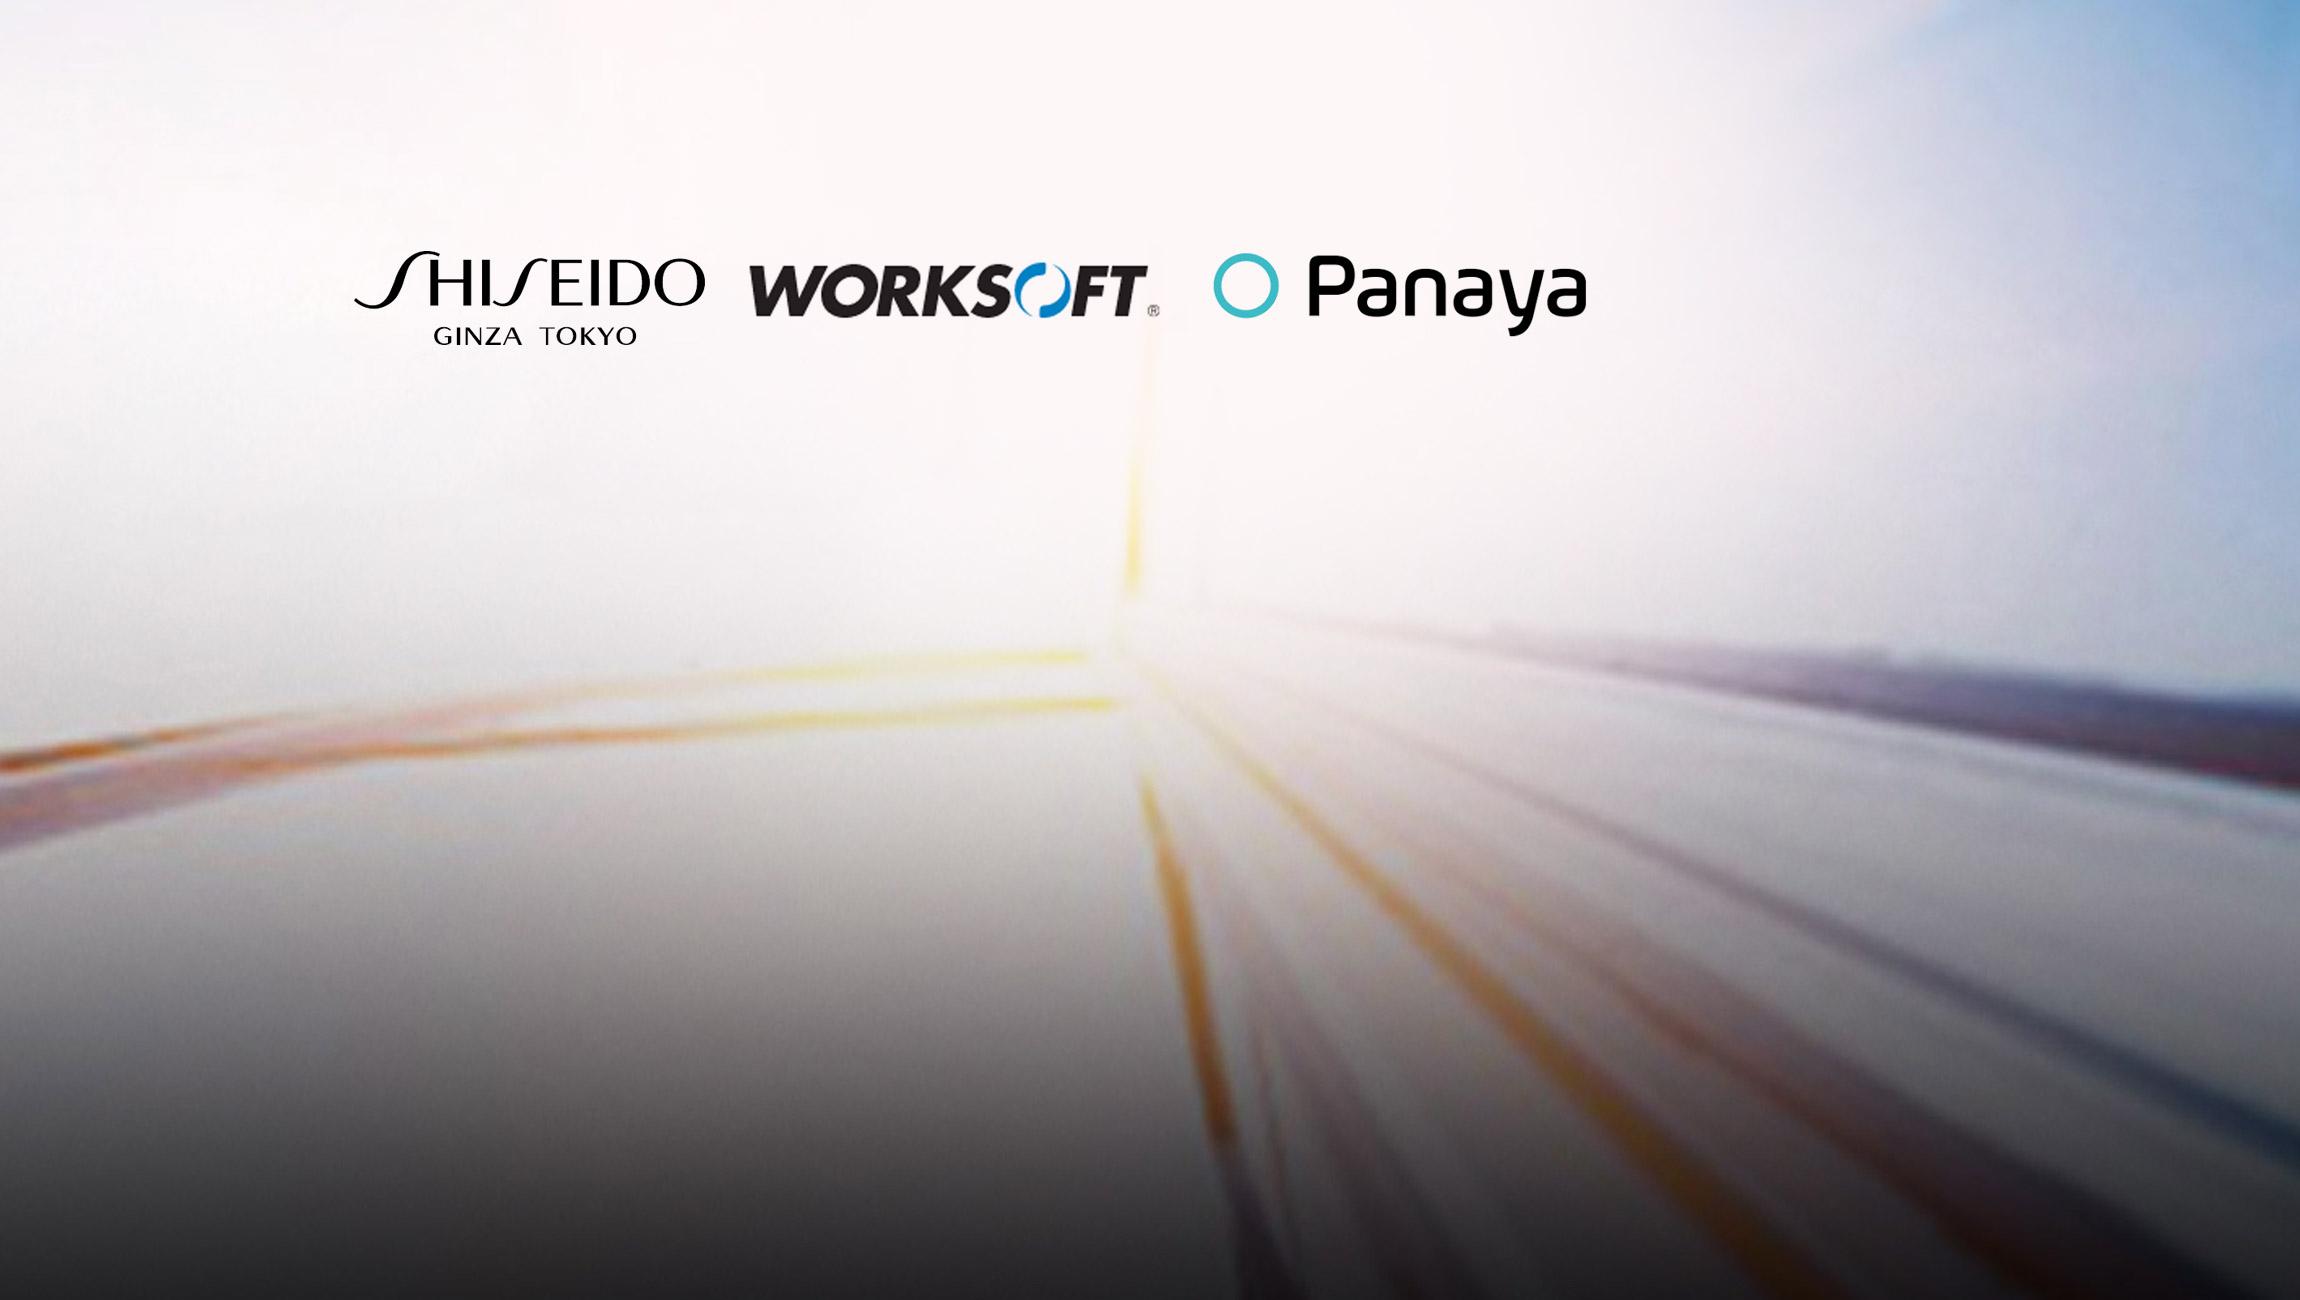 Cosmetics-Giant-Shiseido-Selects-Panaya-and-Worksoft-to-Enhance-Global-S-4-HANA-Deployment